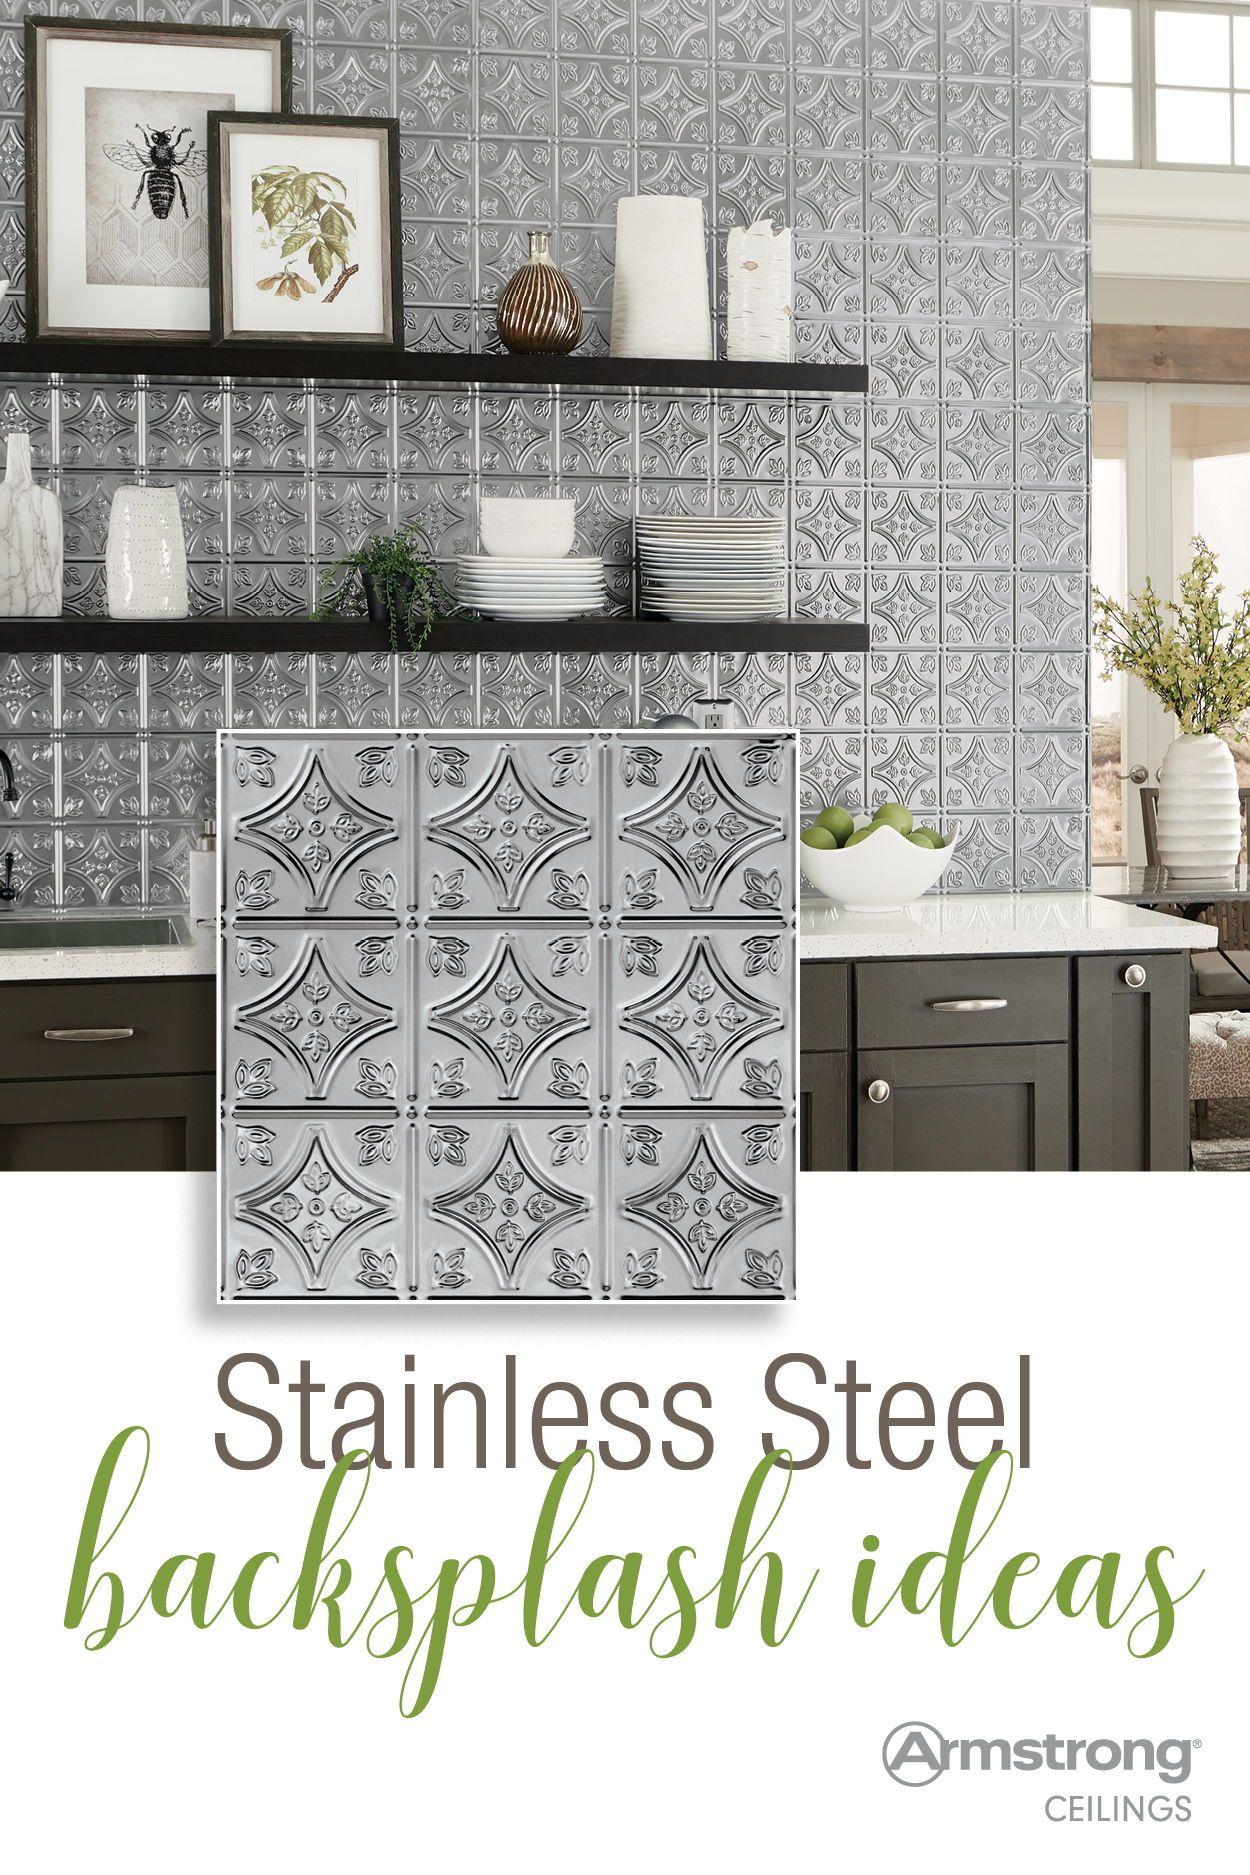 Stainless Steel Backsplash Ideas From Armstrong Ceilings Sponsored Metal Tile Backsplash Metallic Backsplash Stainless Steel Backsplash